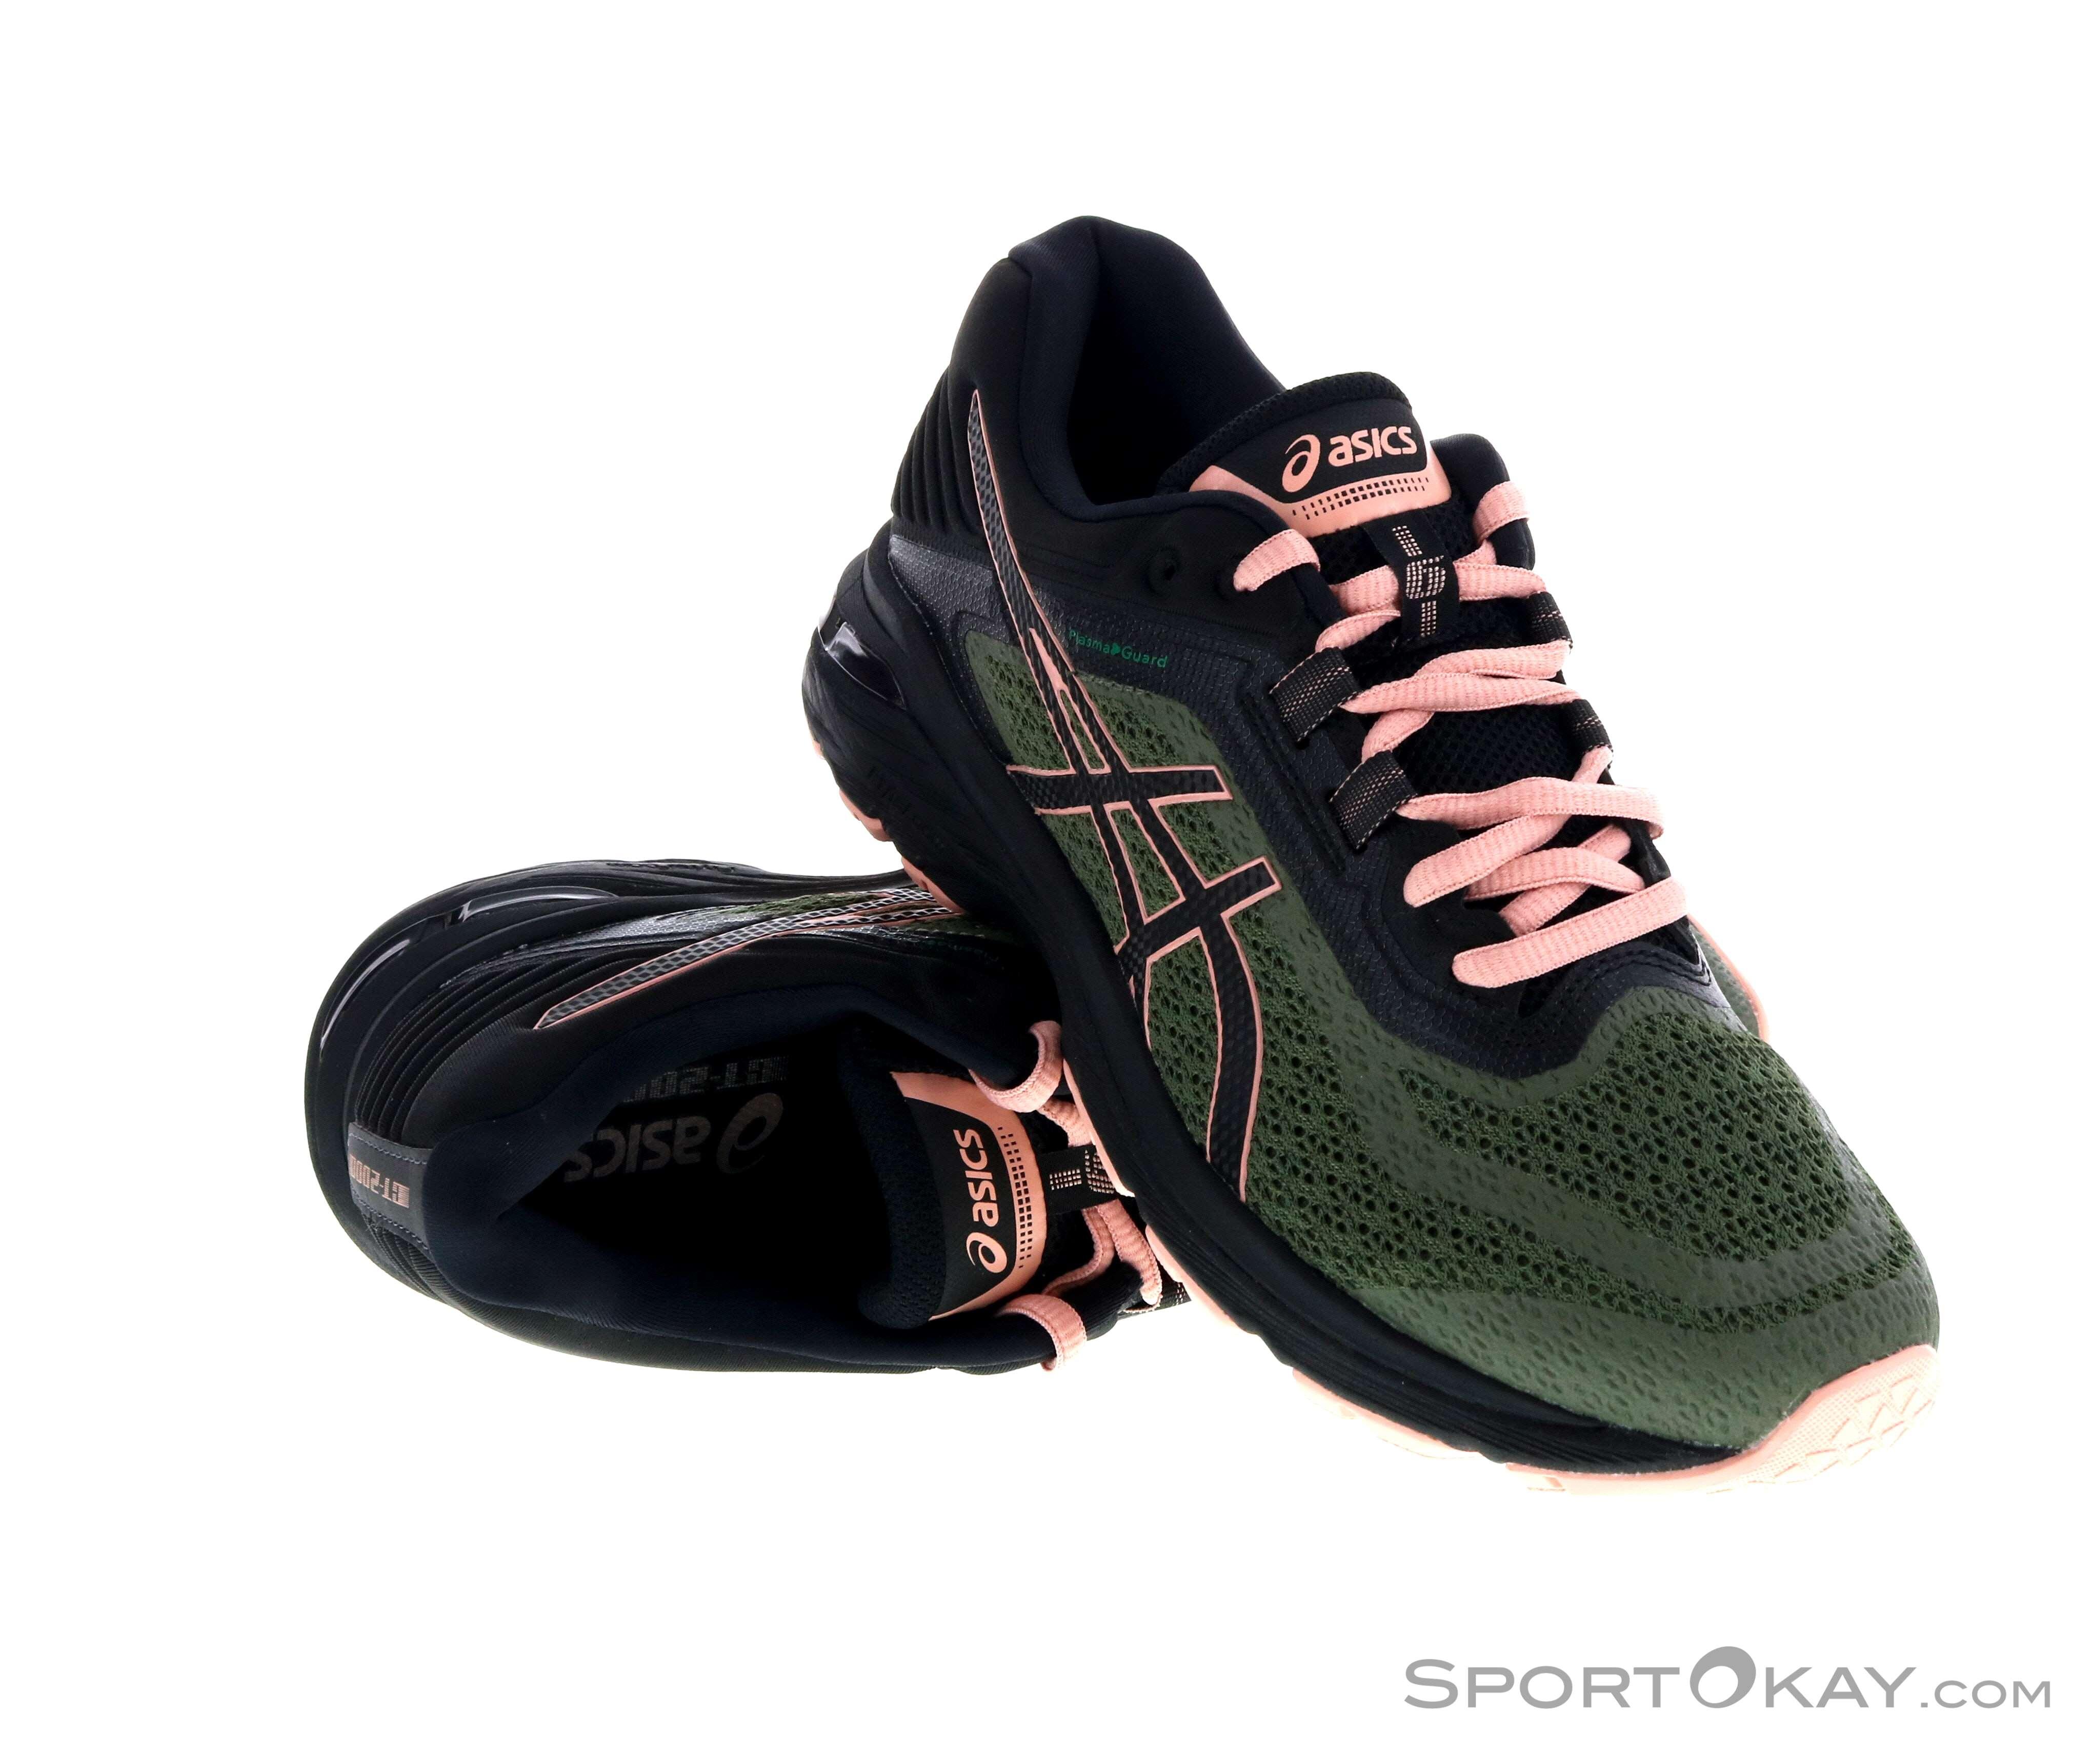 Asics GT-2000 6 Trail Damen Traillaufschuhe-Schwarz-9,5